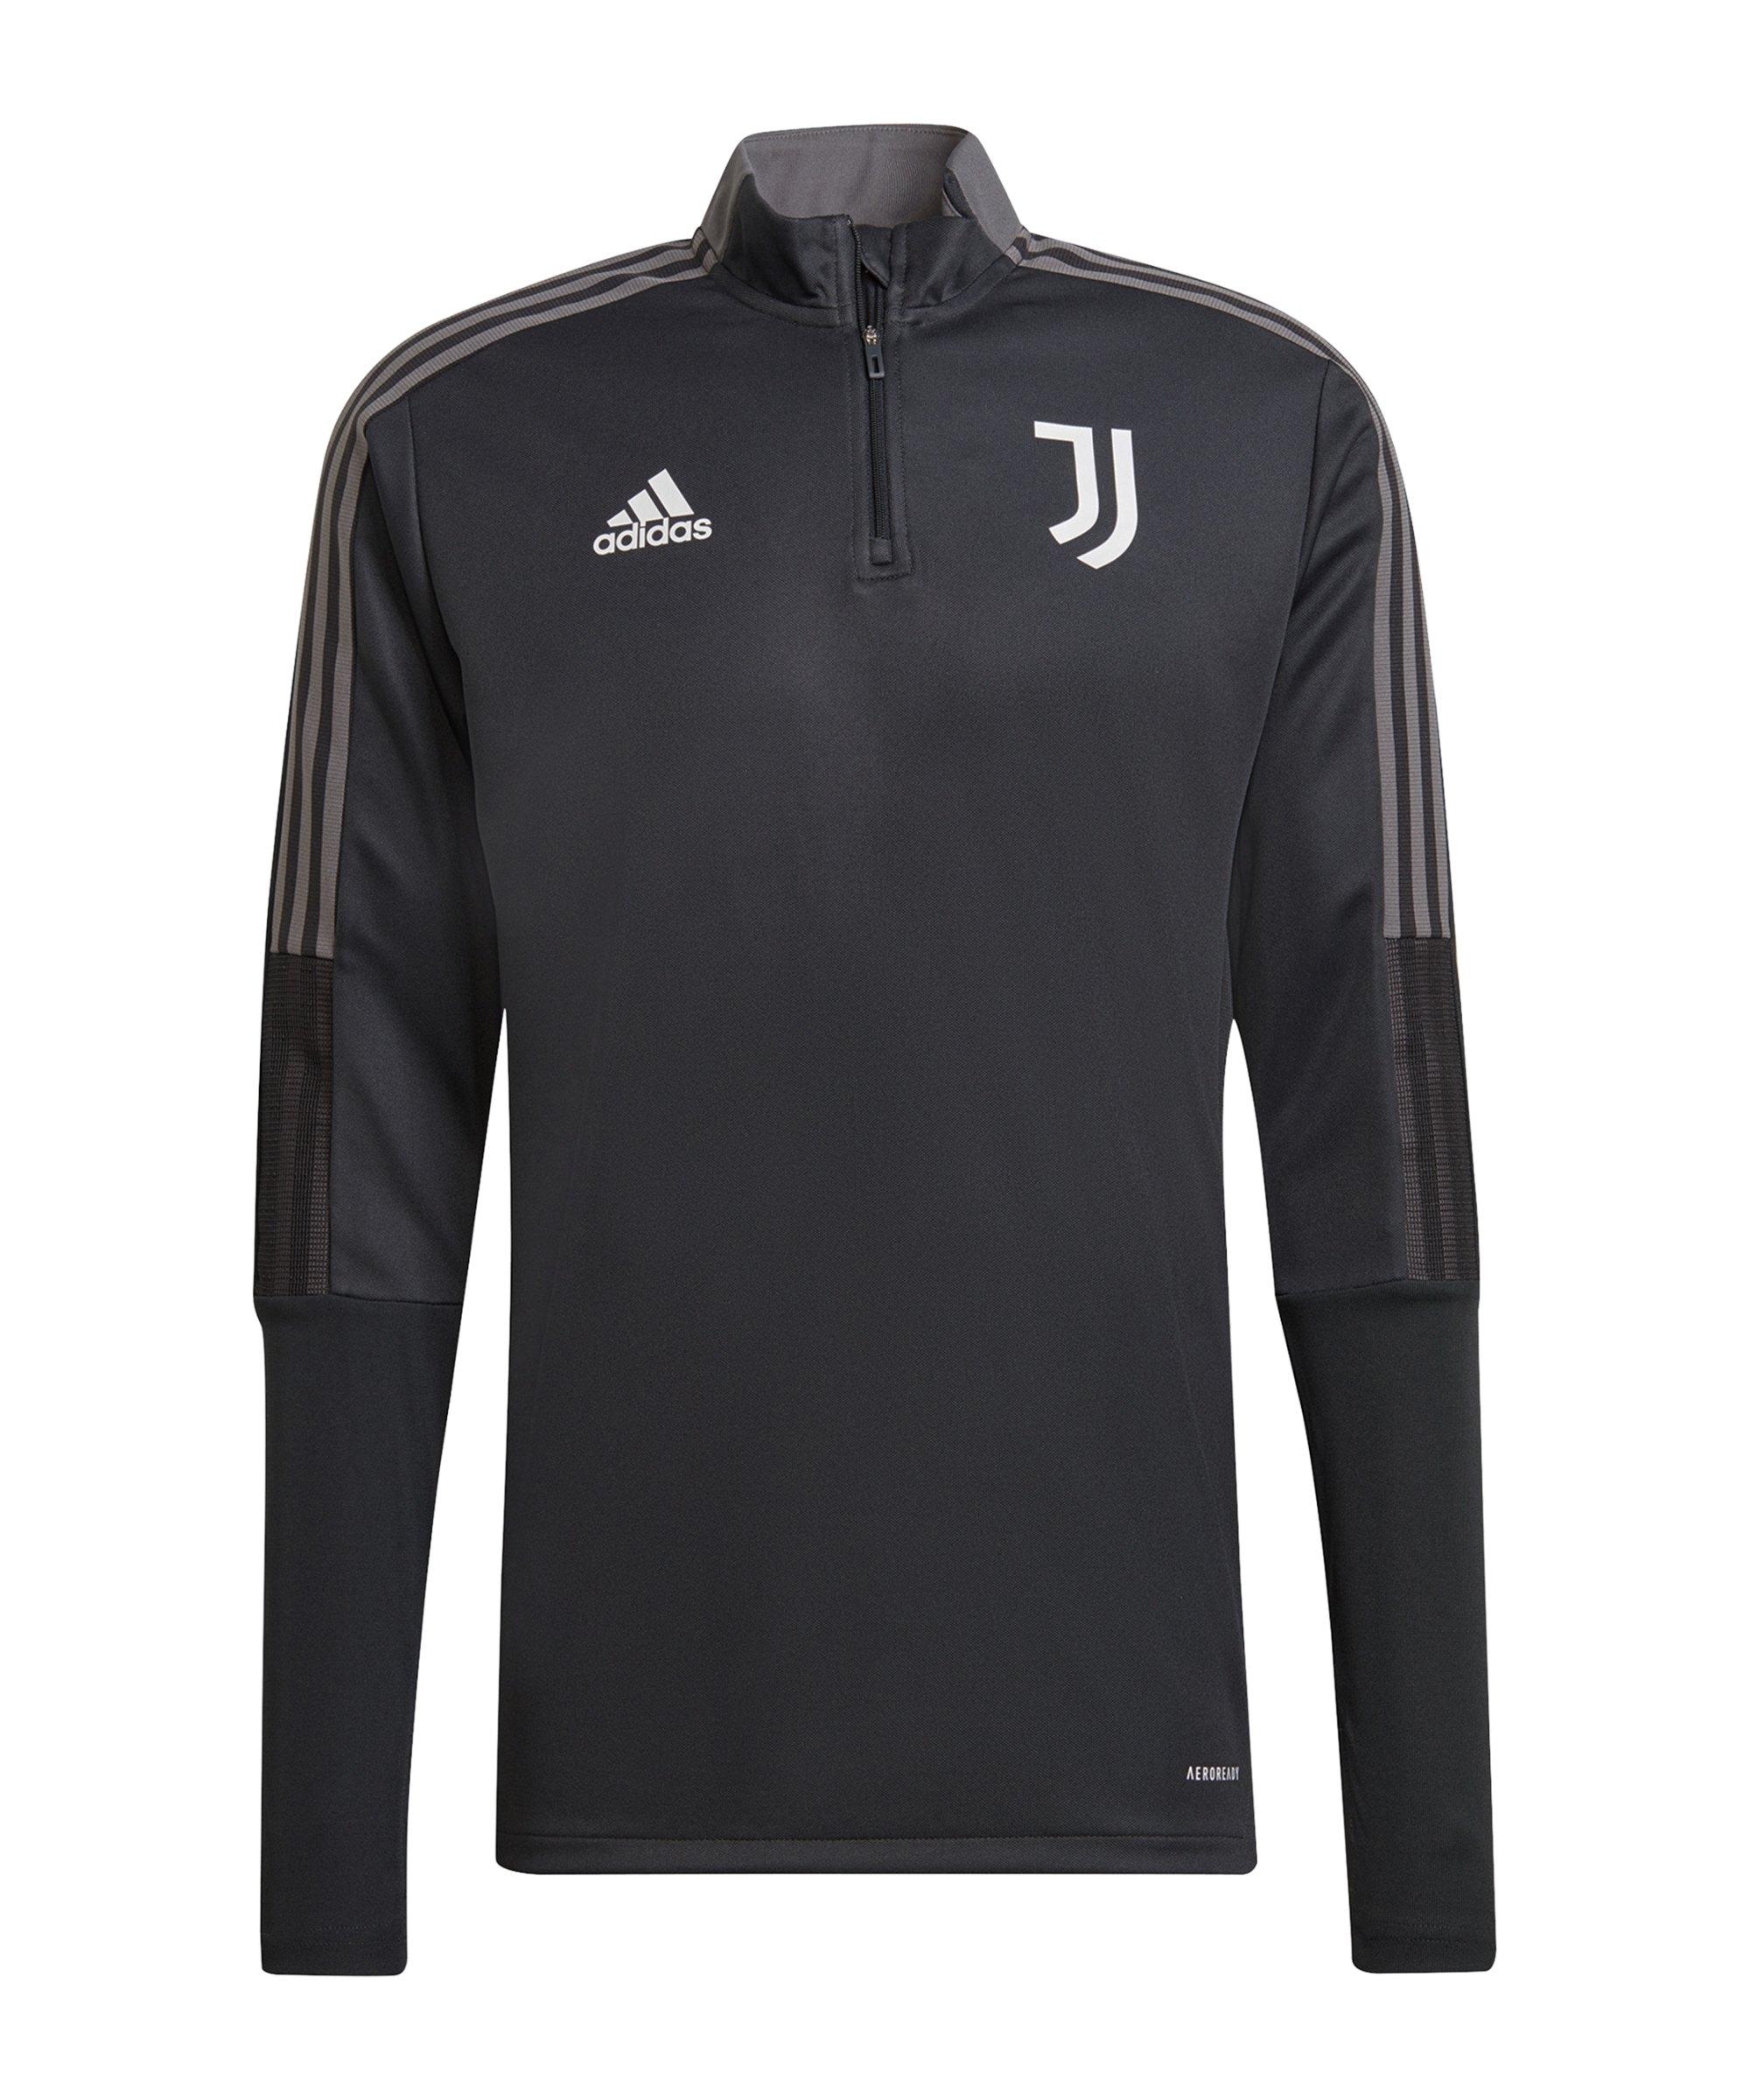 adidas Juventus Turin HalfZip Sweatshirt Grau - grau